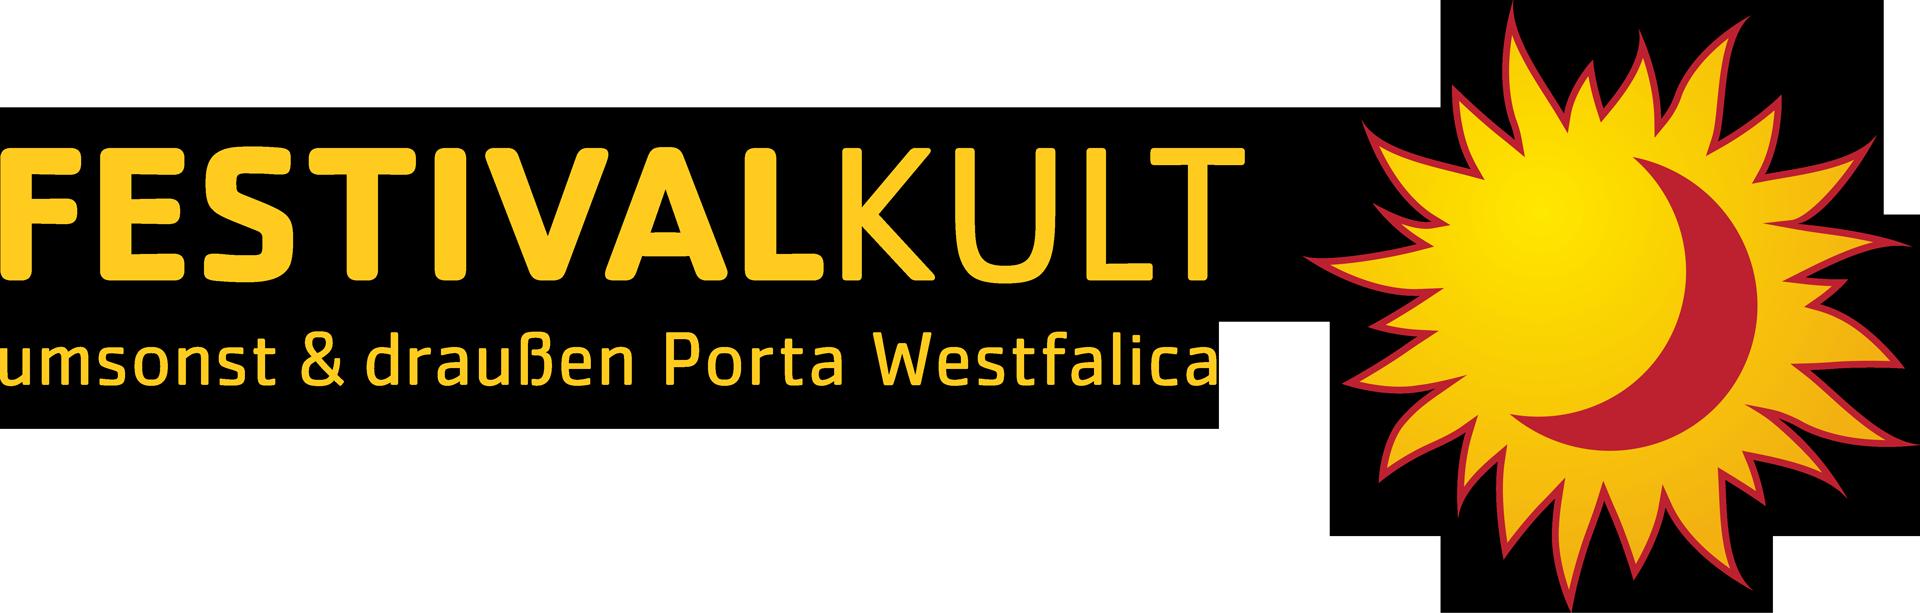 Festivalkult Logo 2019